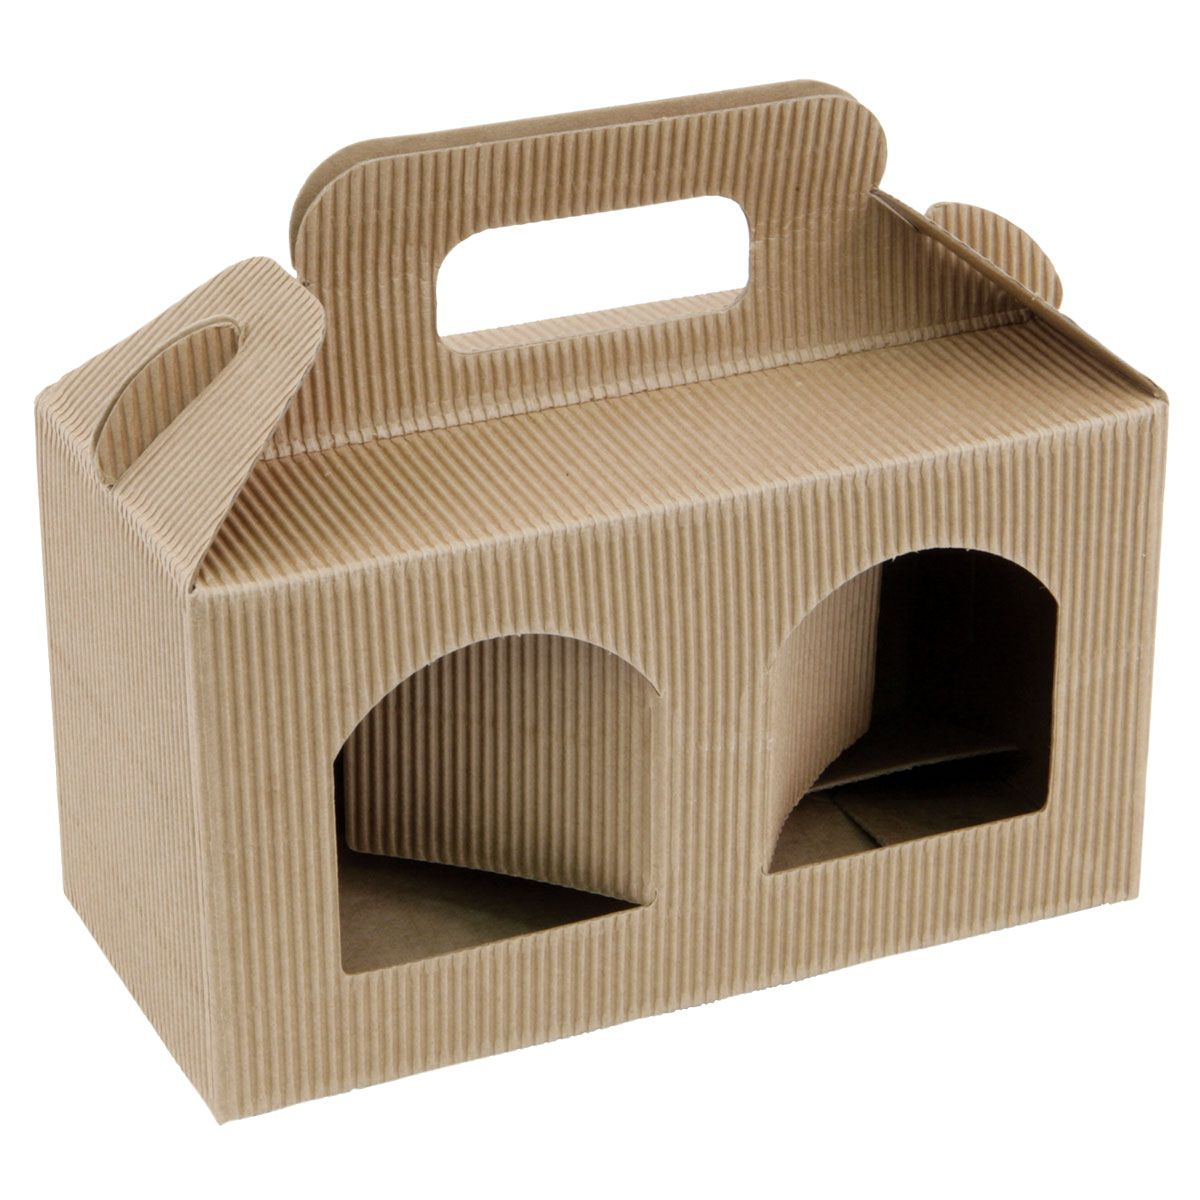 Small 2 jar carton - Natural Fluted with Windows - WBC: http://www.wbc.co.uk/2-small-jar-kraft-carton-with-windows-95mm-high?sc=64&category=93456 60p each